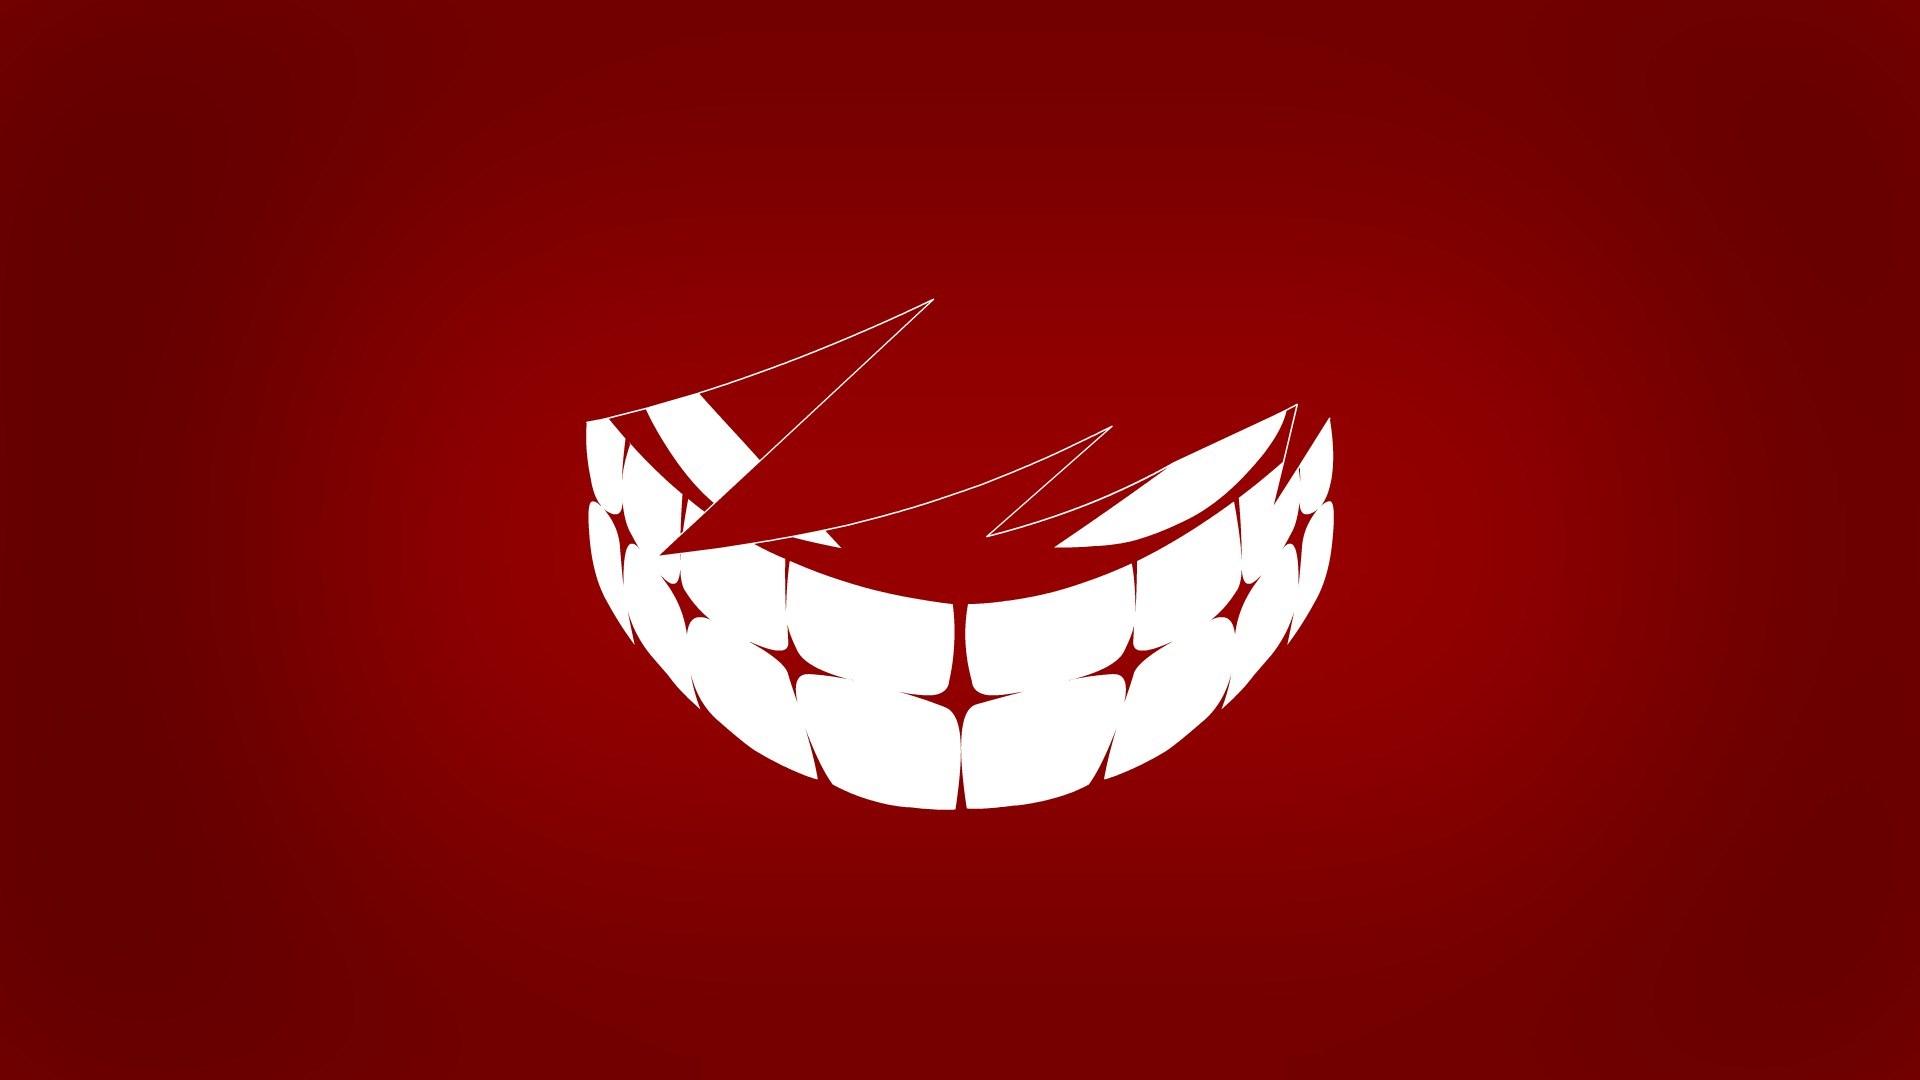 Art Smile Red